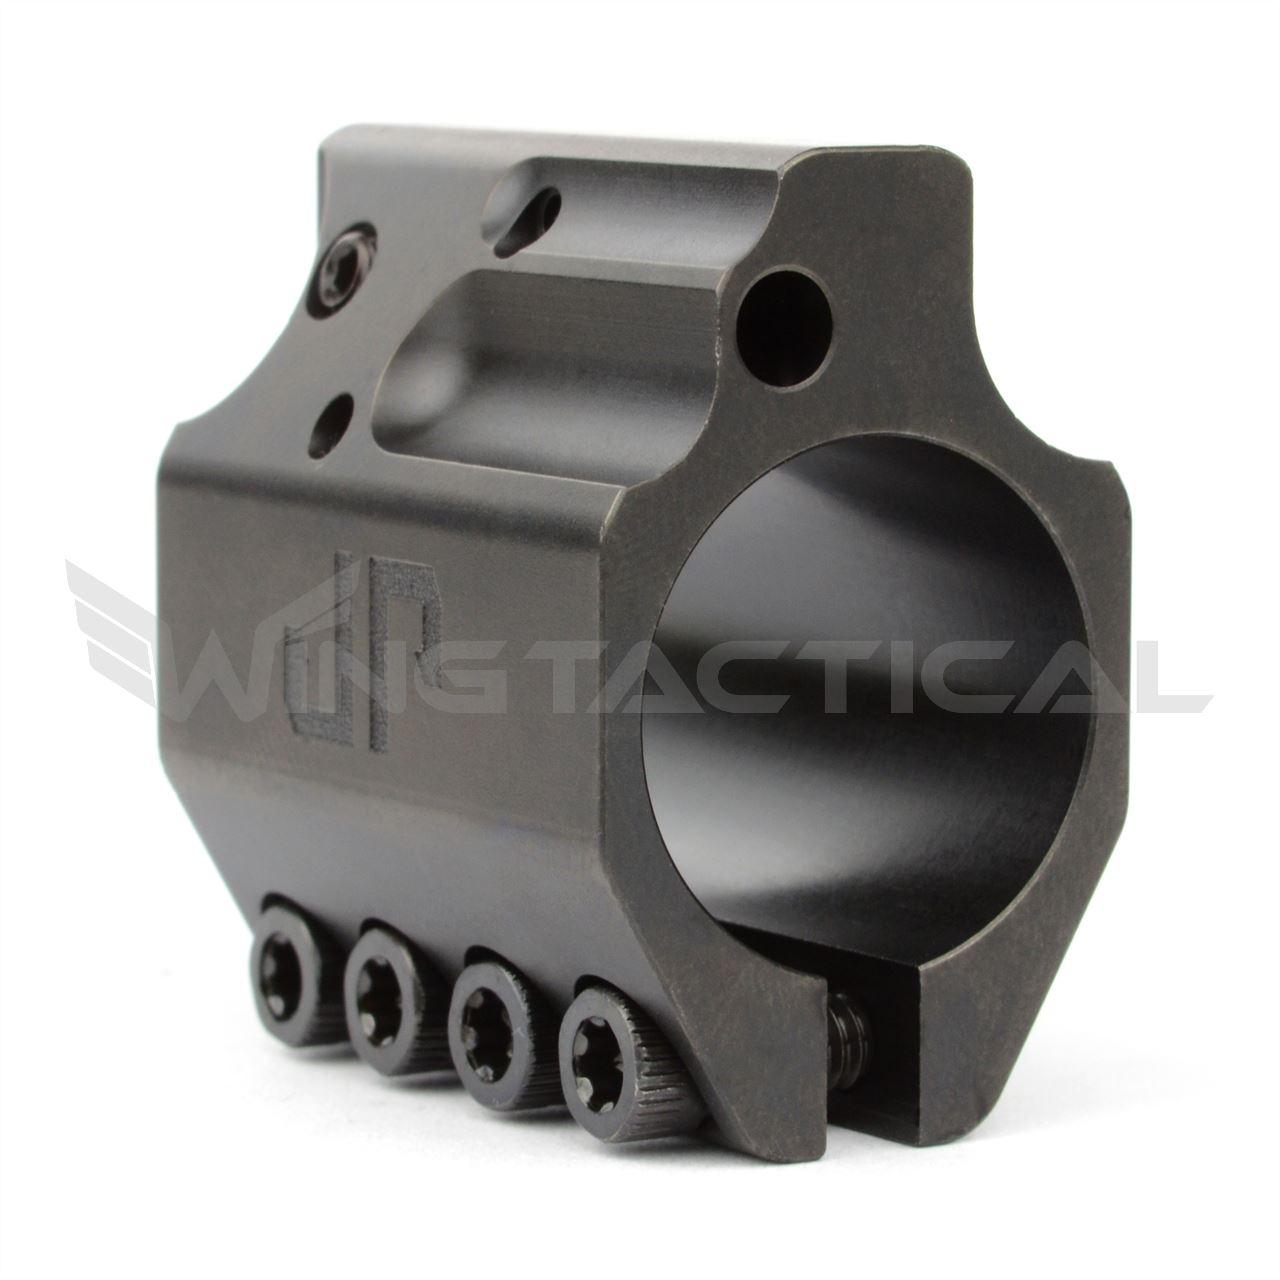 JP Enterprises .750 Adjustable Gas Block in QPQ Black Finish